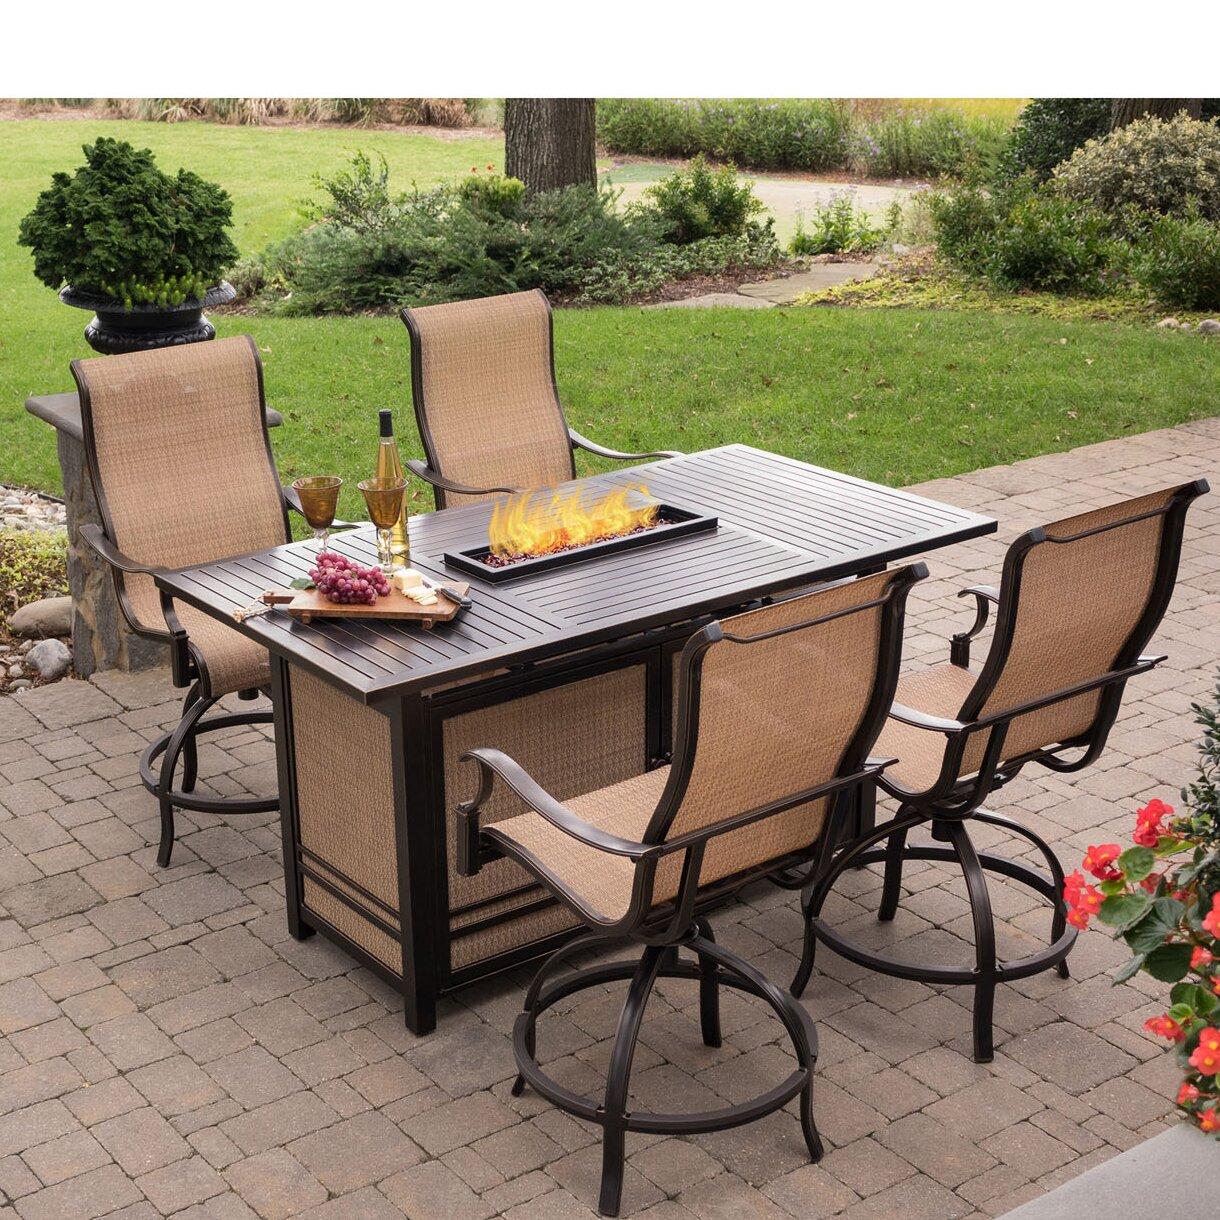 5 Piece Bar Table Set Hanover Monaco 5 Piece Bar Set With 30000 Btu Firepit Wayfair